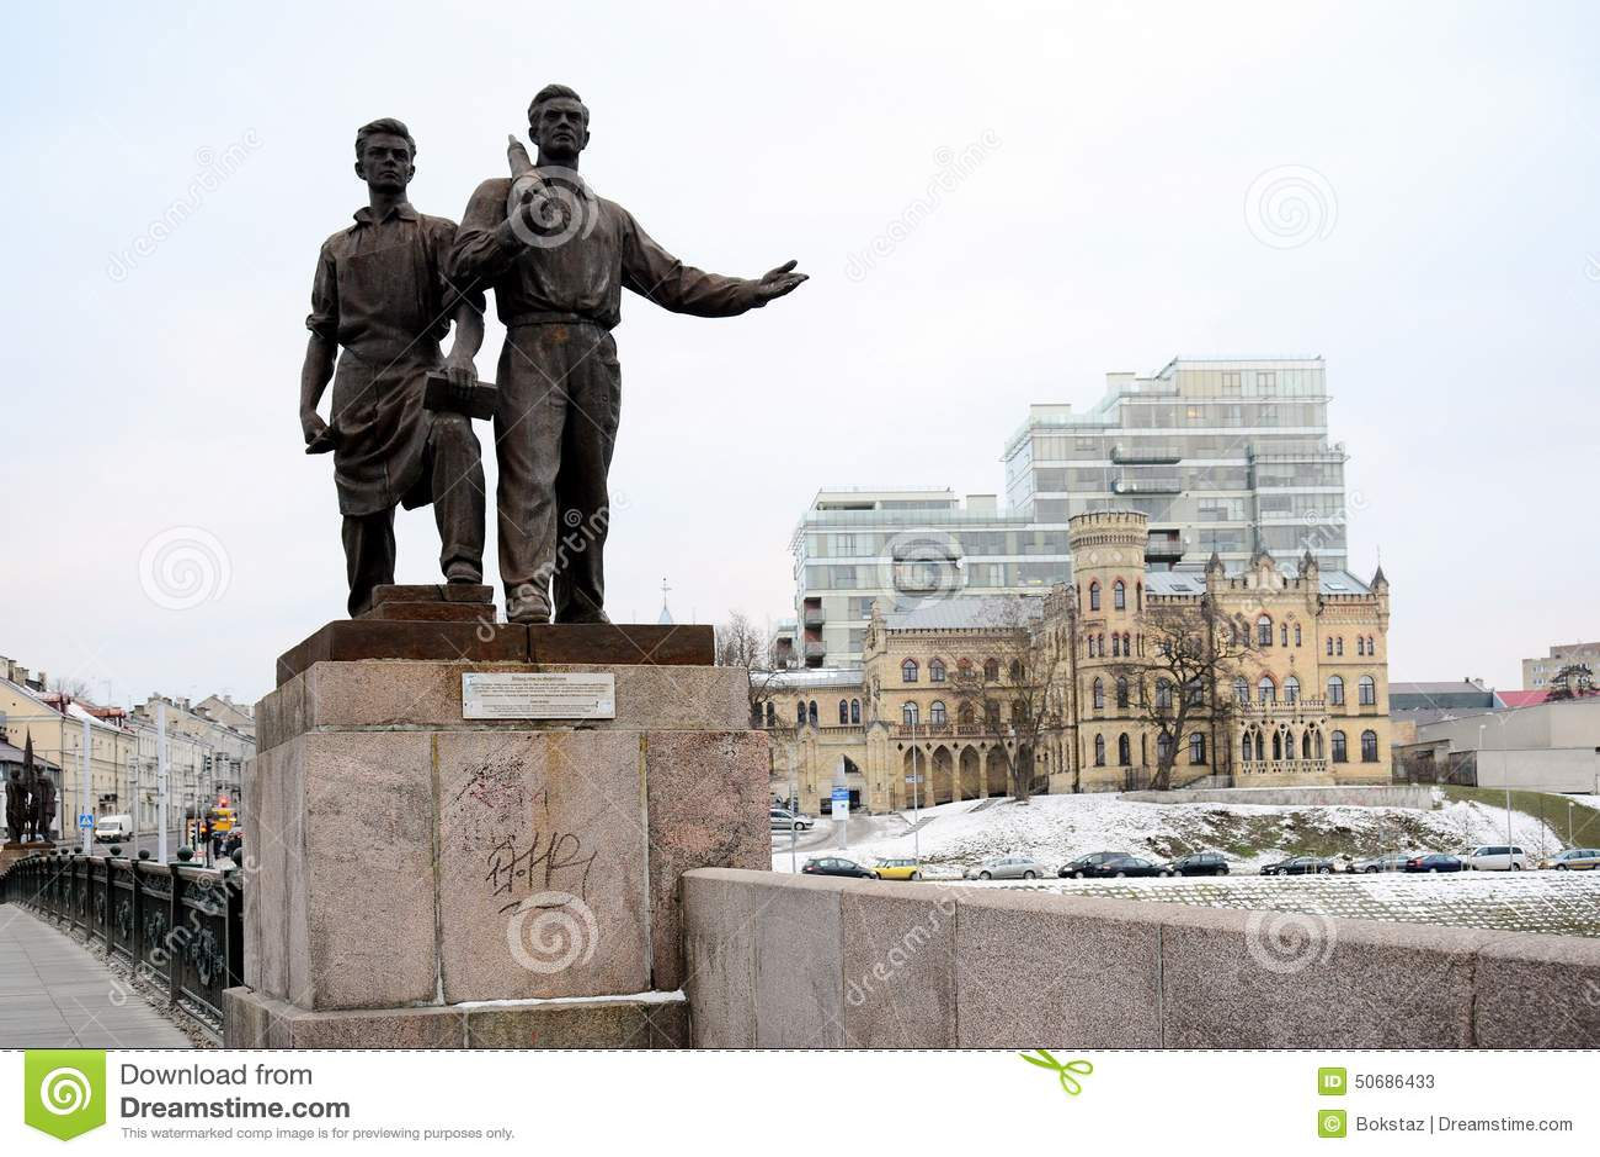 Download 工作者雕塑绿色桥梁的 库存图片. 图片 包括有 石头, 贿赂, 室外, 拱道, 立陶宛, 历史记录, 垫座 - 50686433